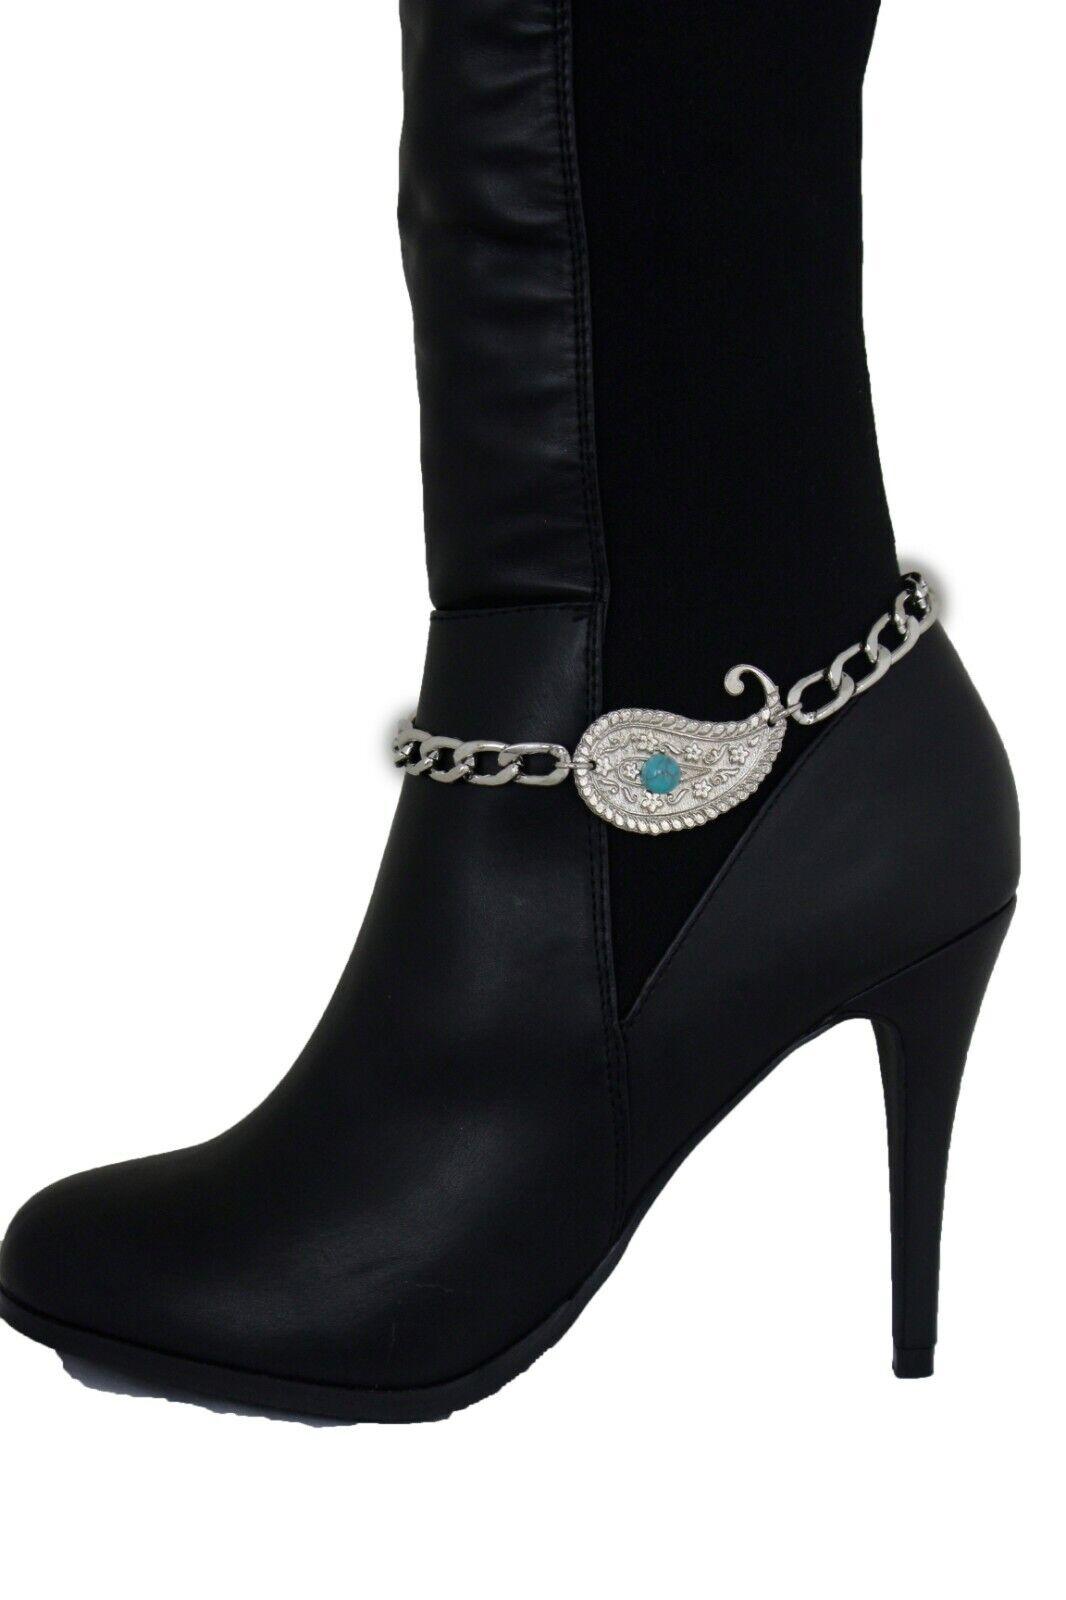 Fun Women Boot Chain Bracelet Shoe Silver Metal Paisley Charm Water Drop Jewelry